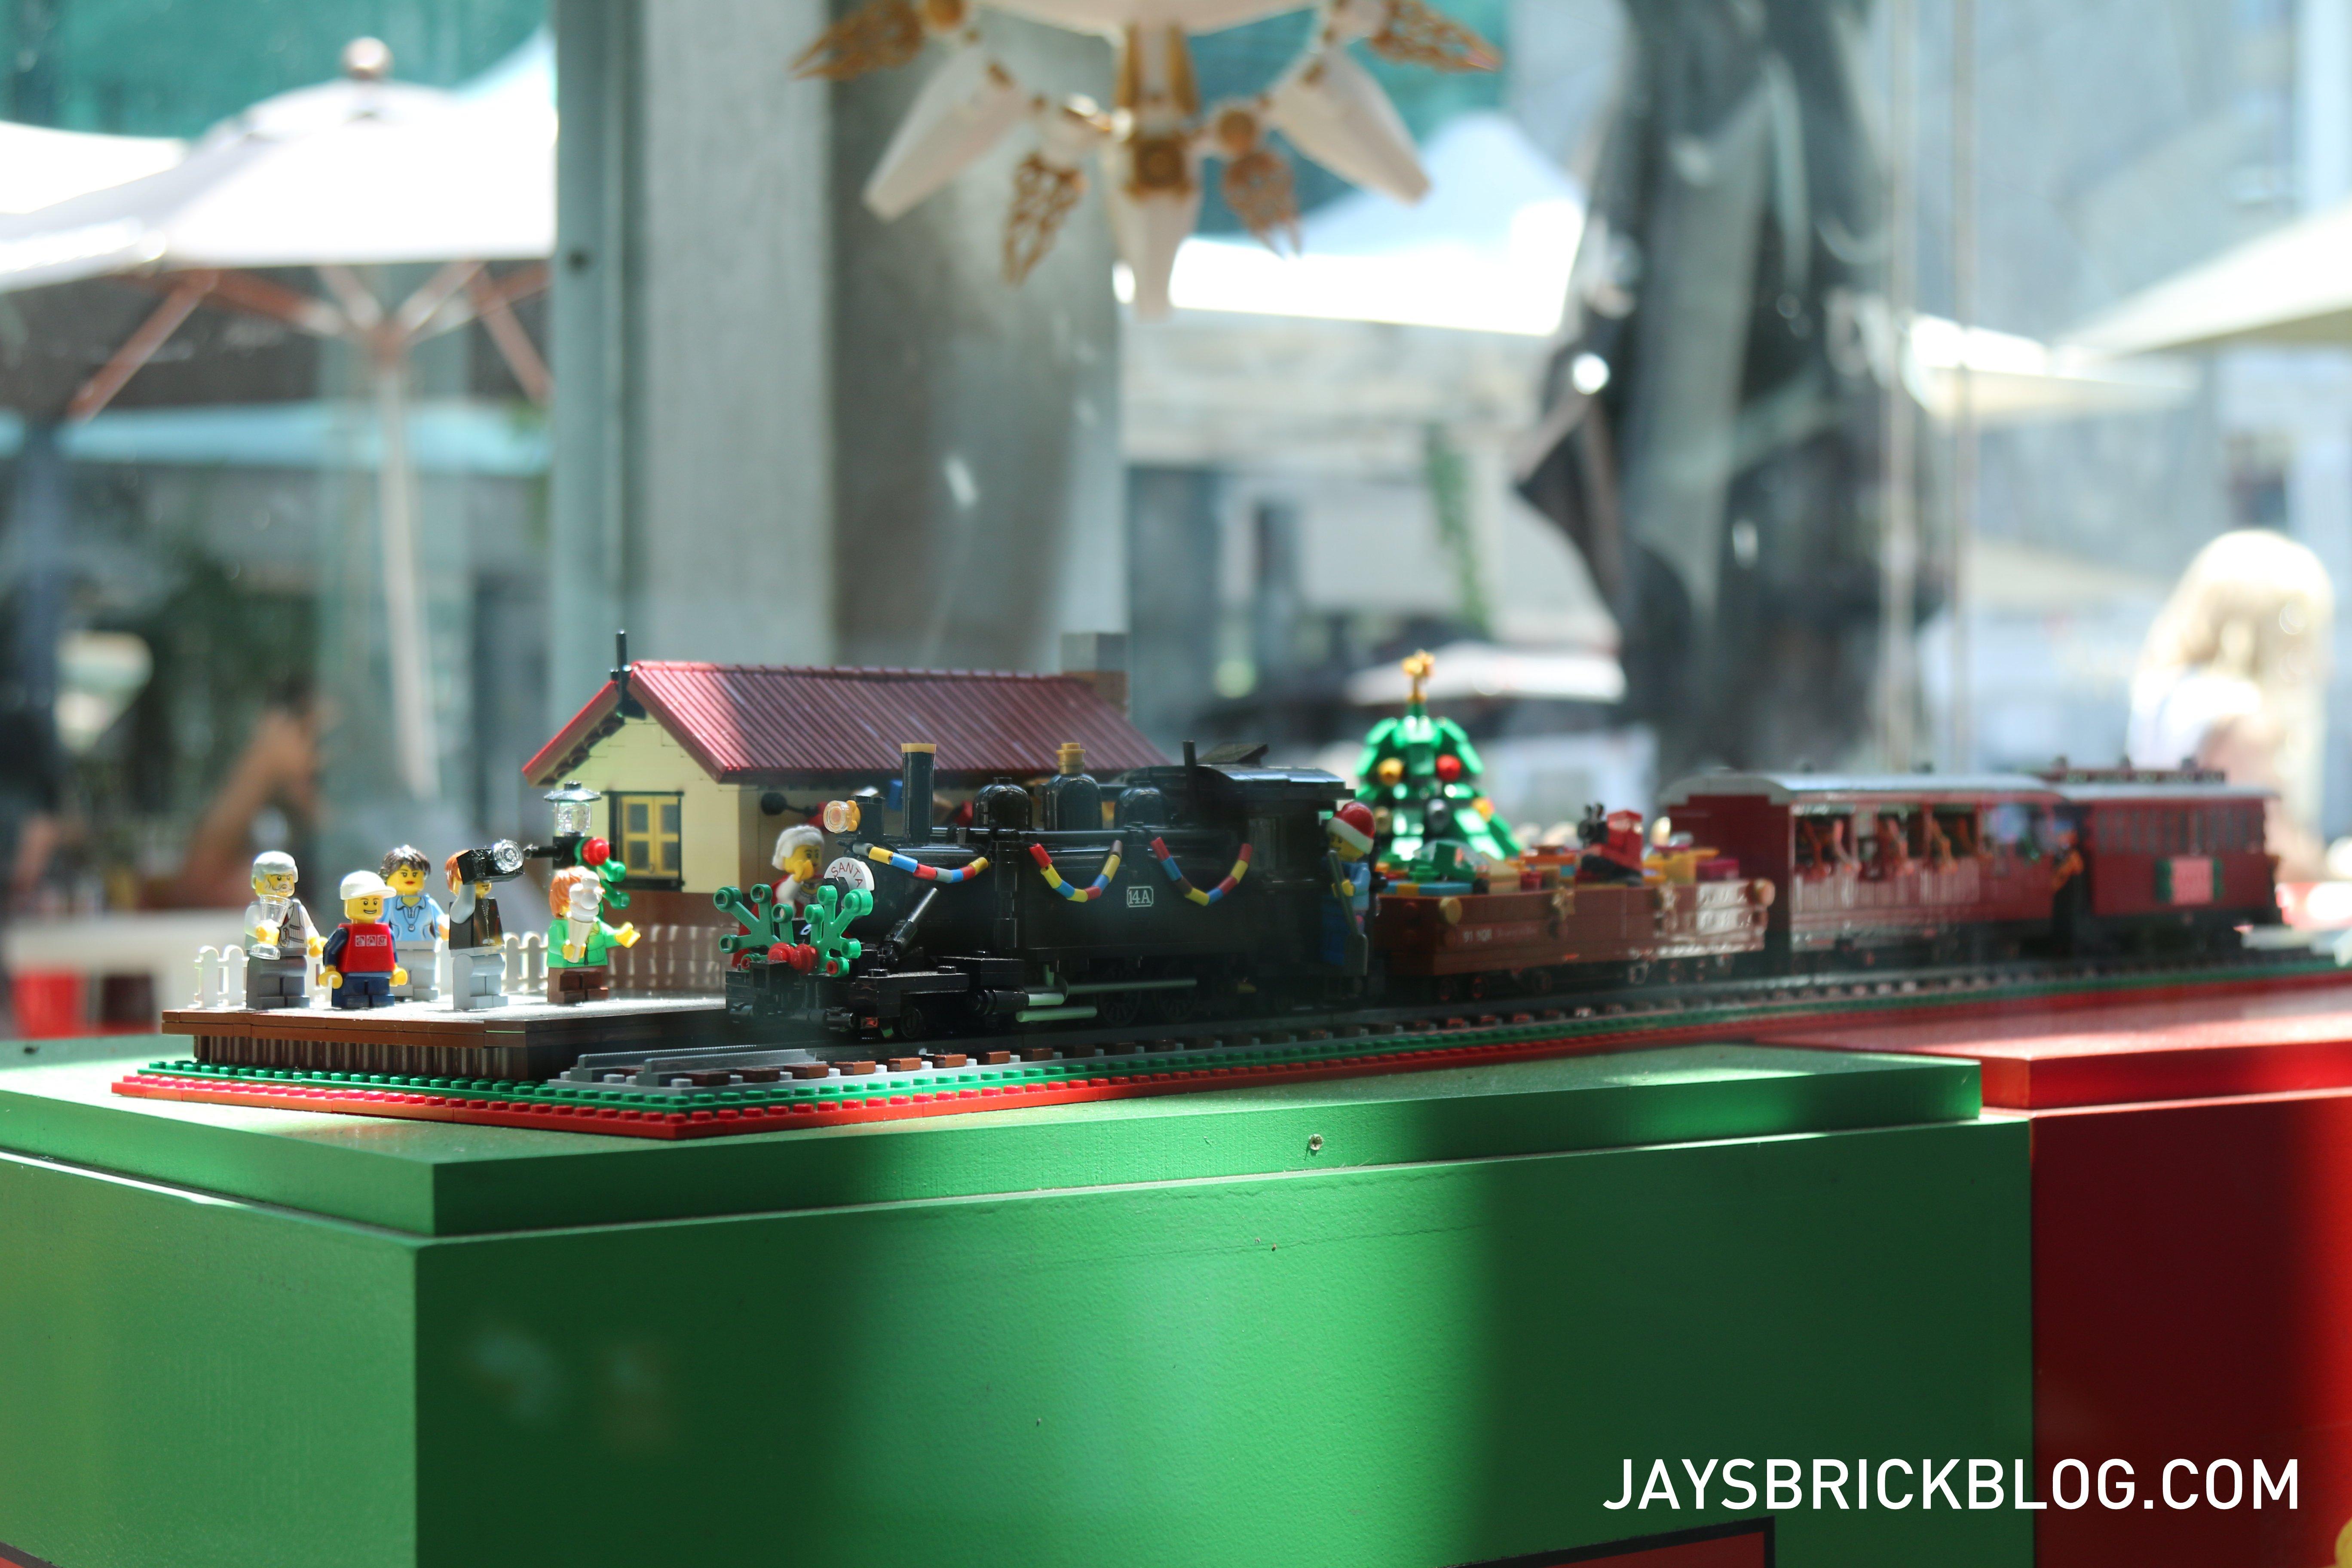 LEGO Christmas Tree Federation Square